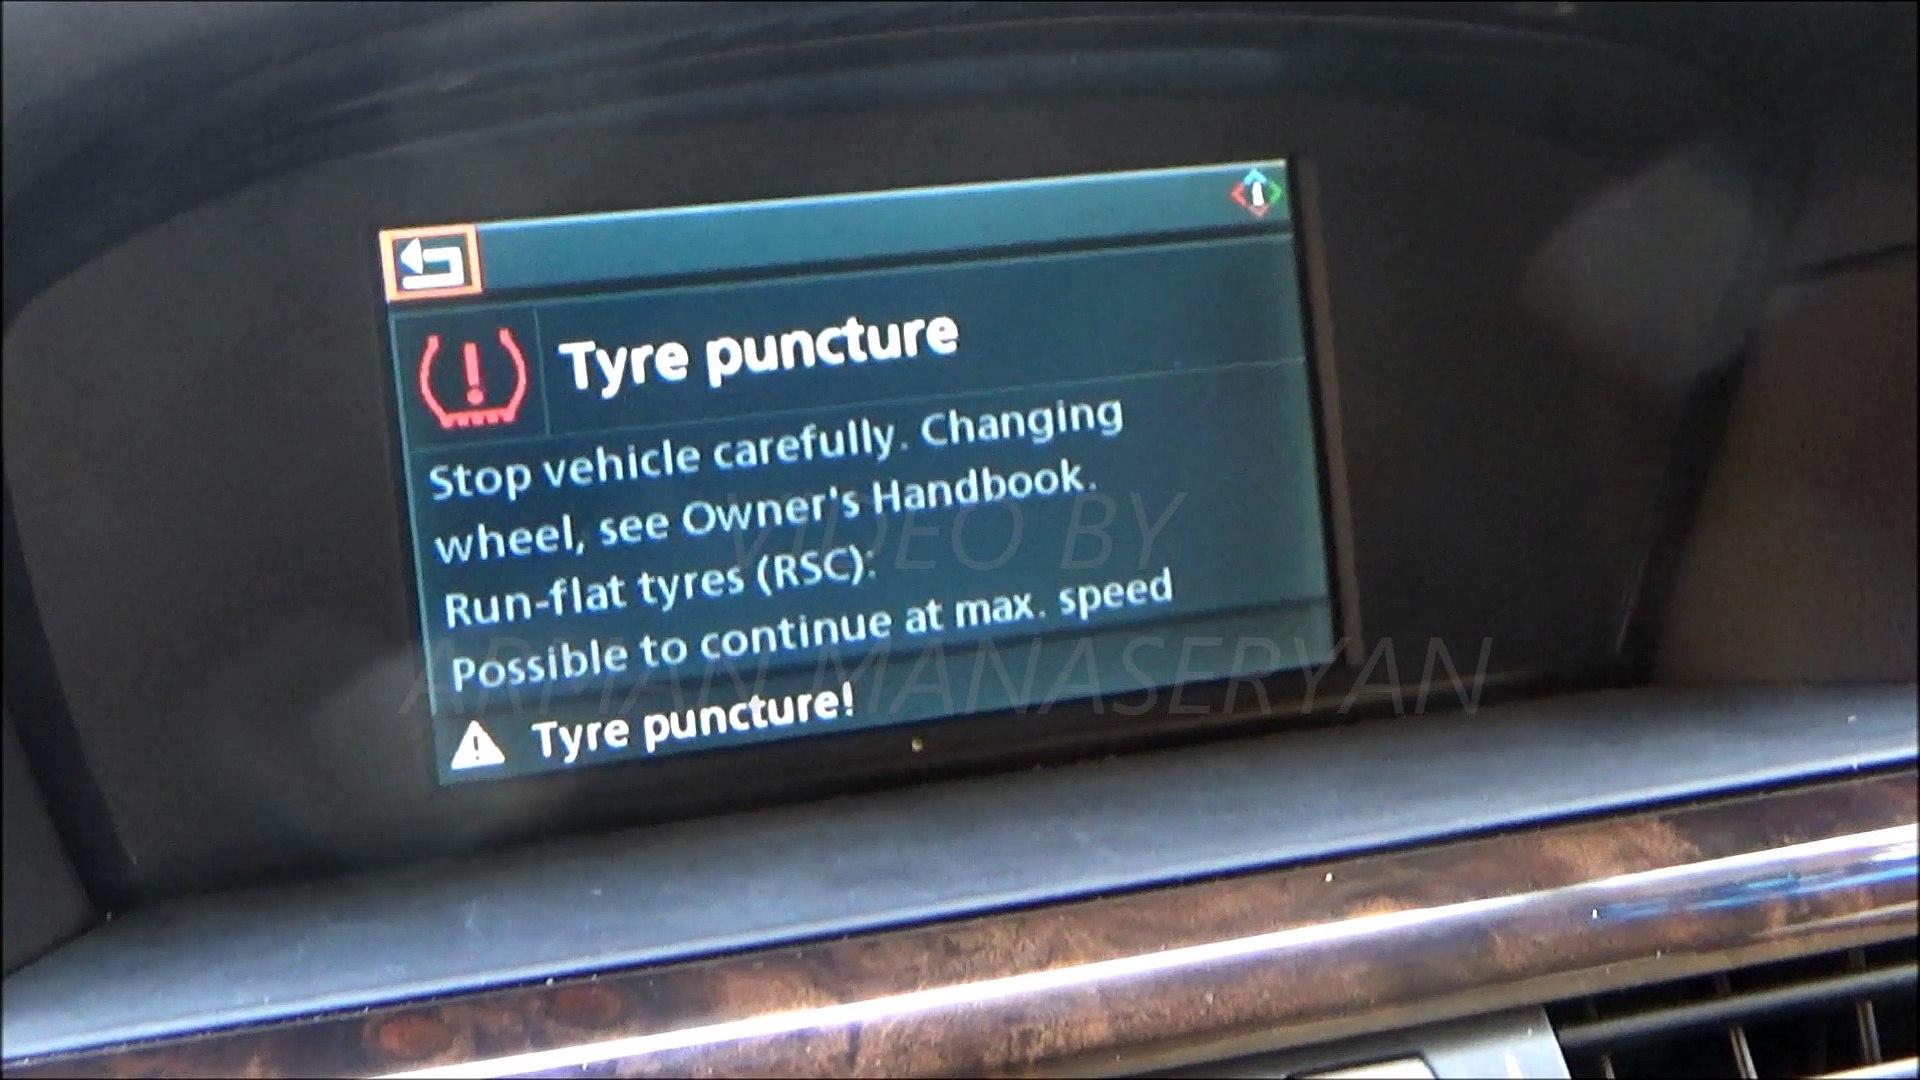 BMW E60  Tire pressure adaptation. адаптация давления в шинах.